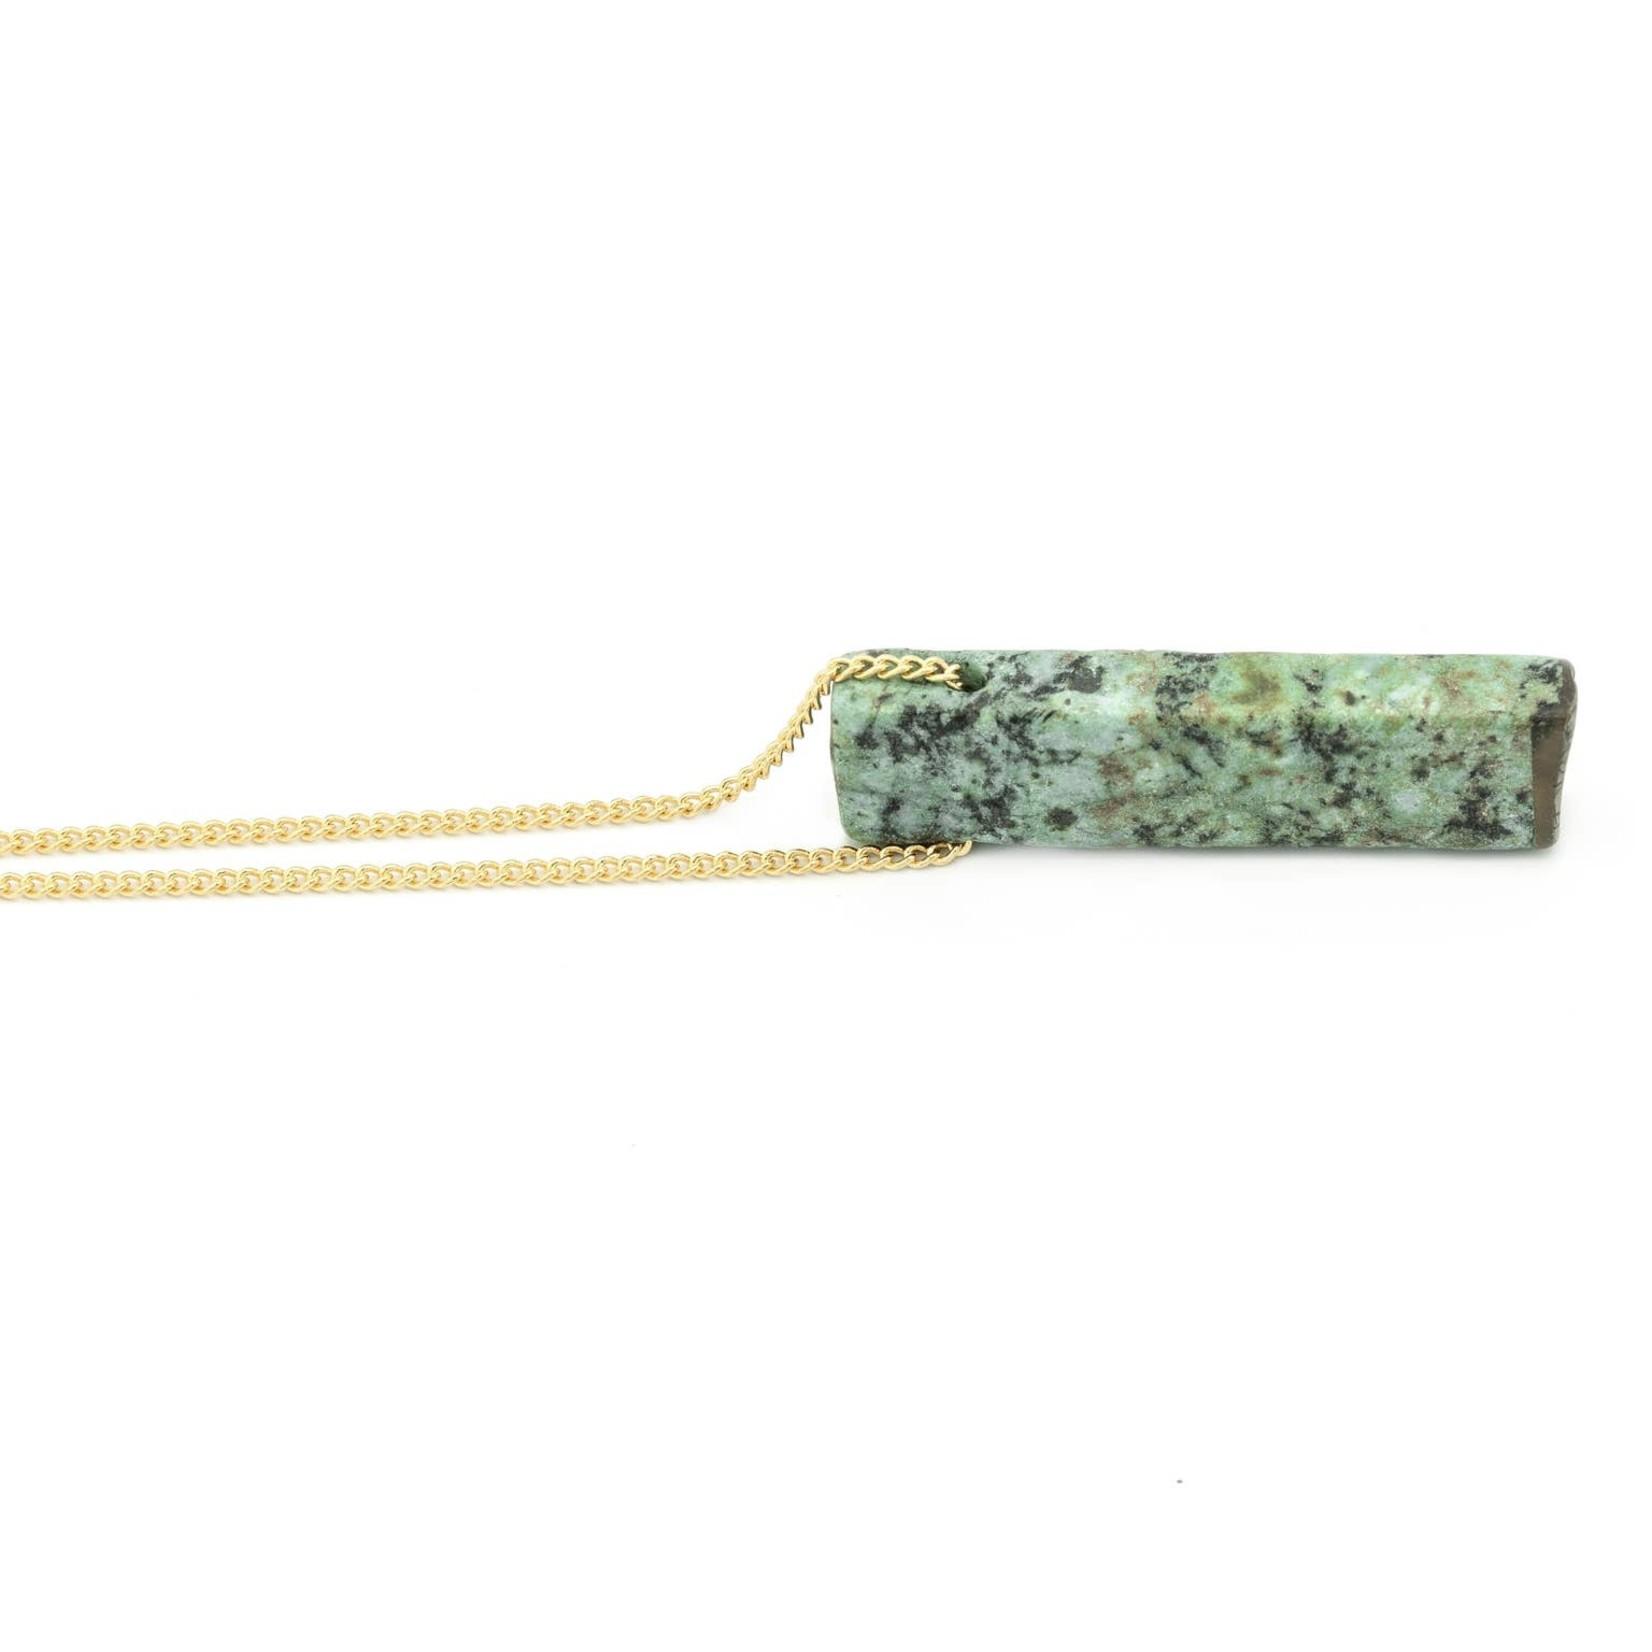 "Mana Made Jewelry Mana 28"" Stone Necklace Turquoise"